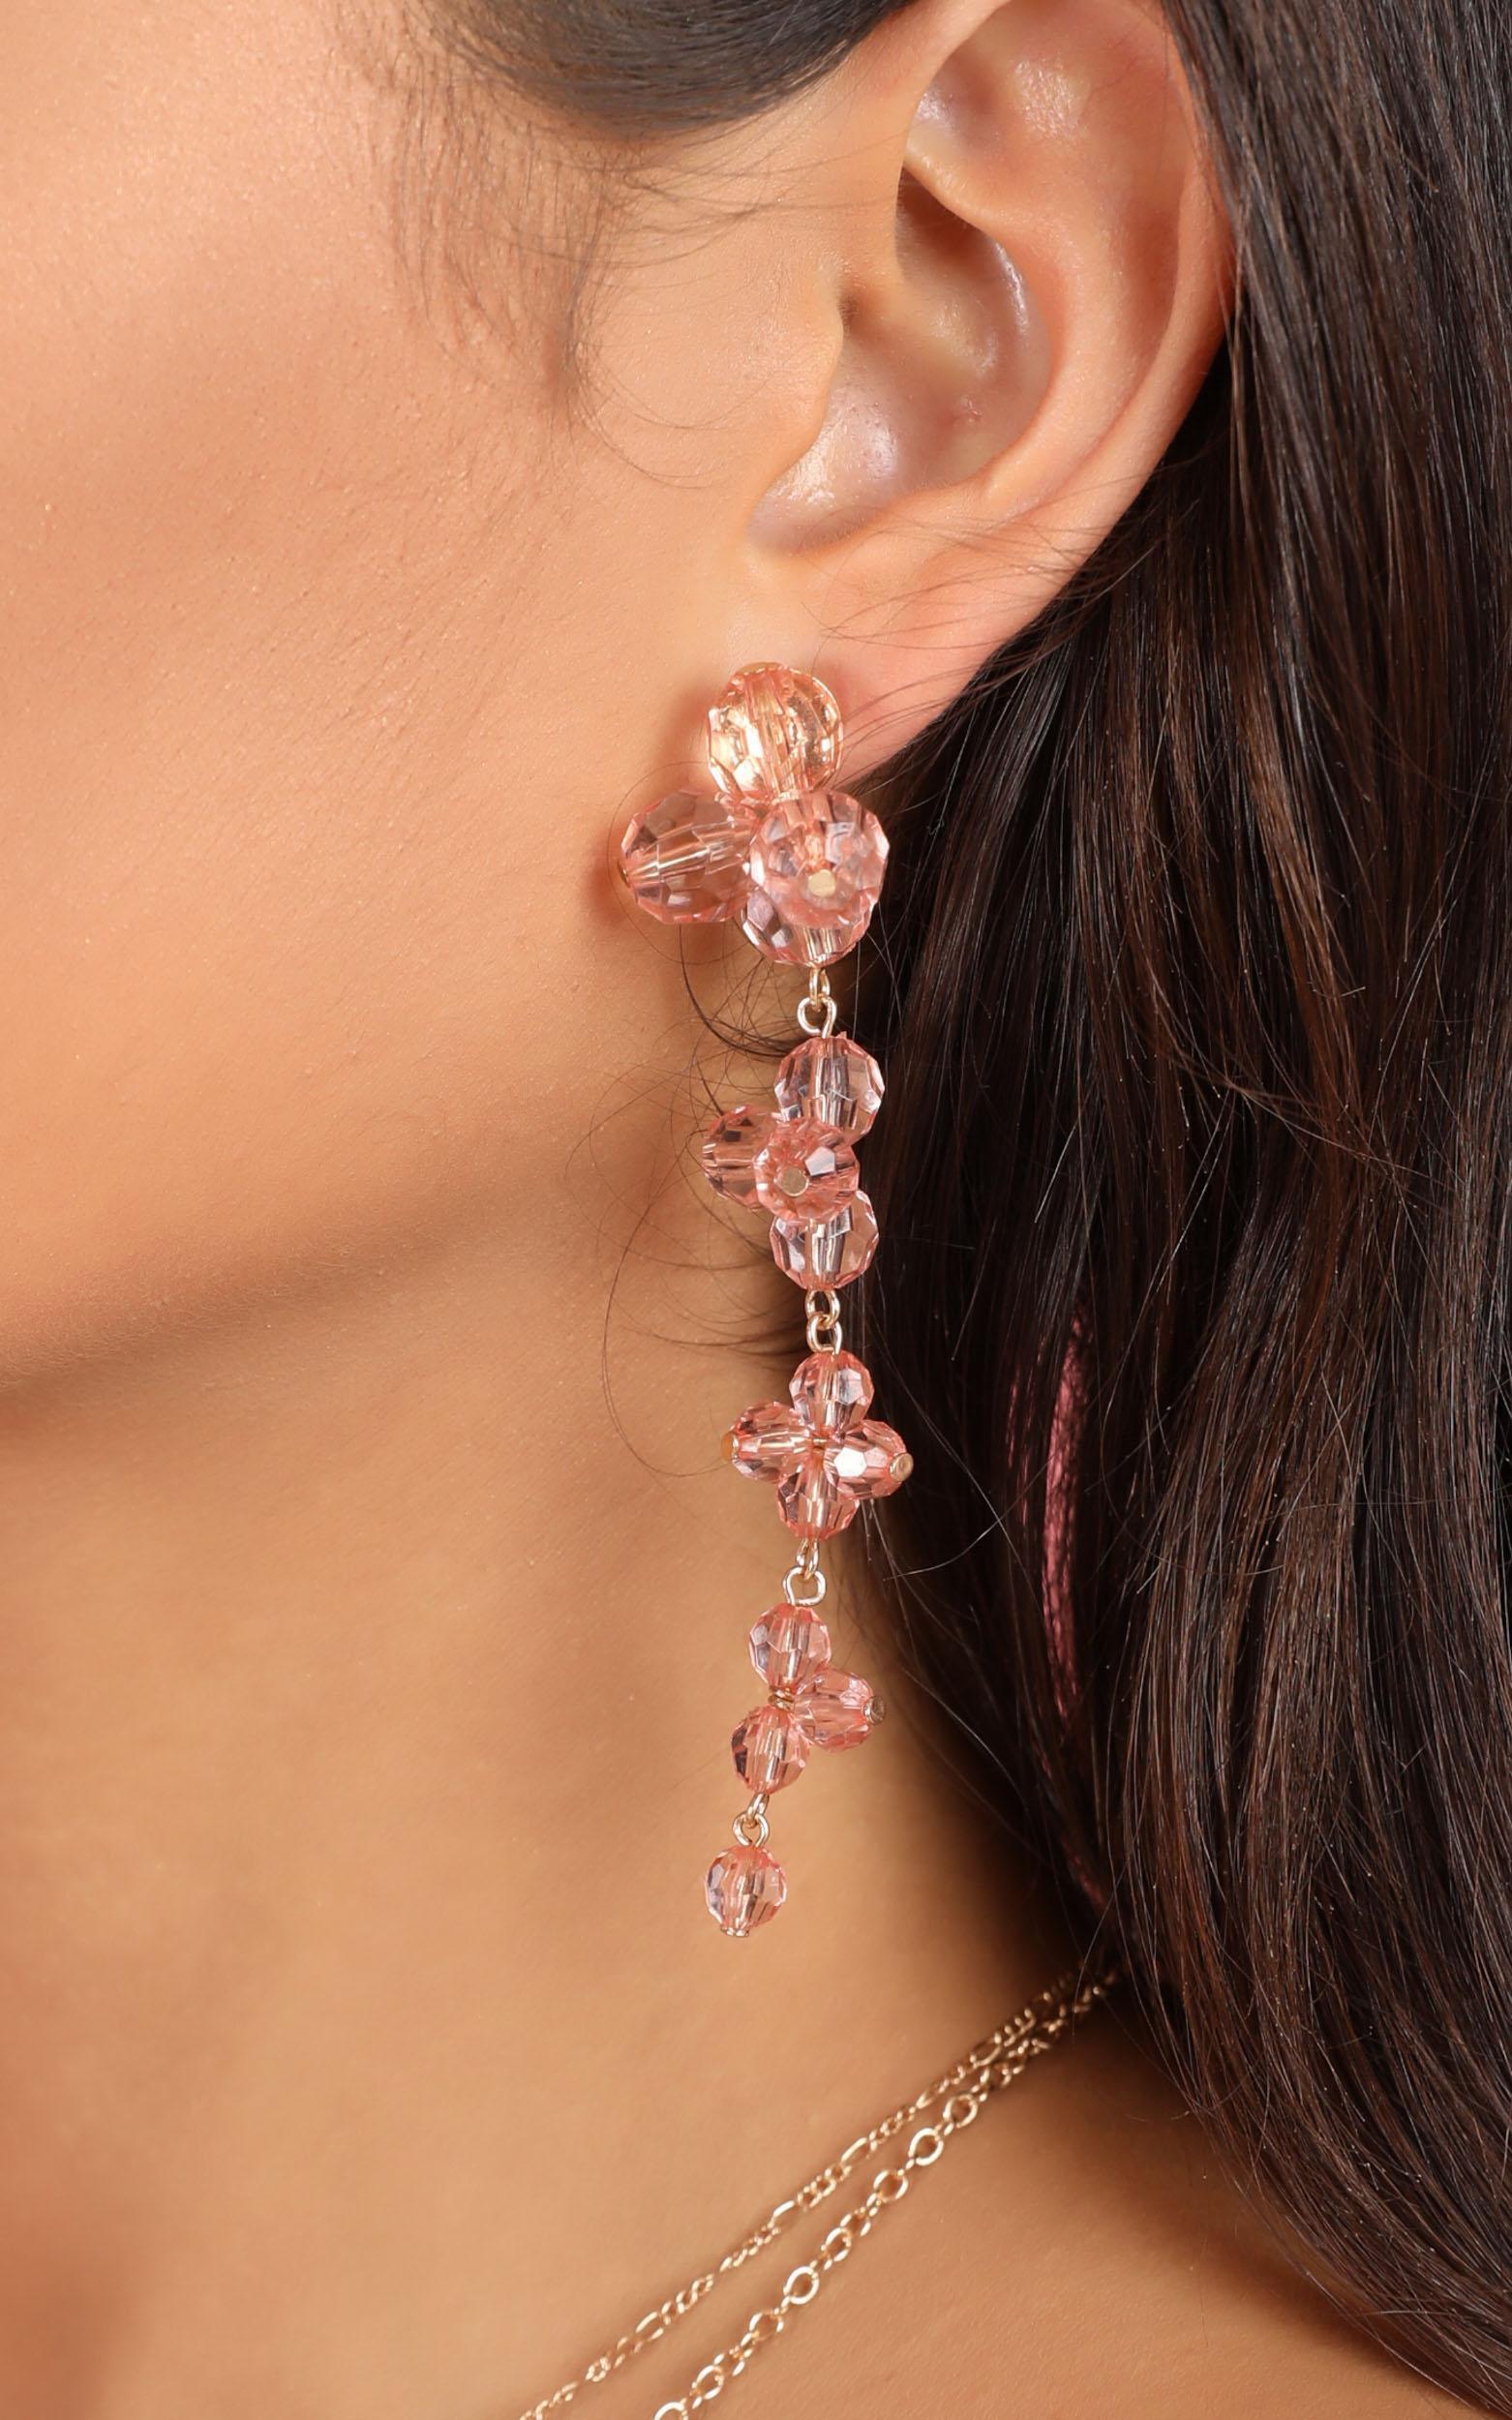 Coming Unstuck Earrings In Pink, , hi-res image number null